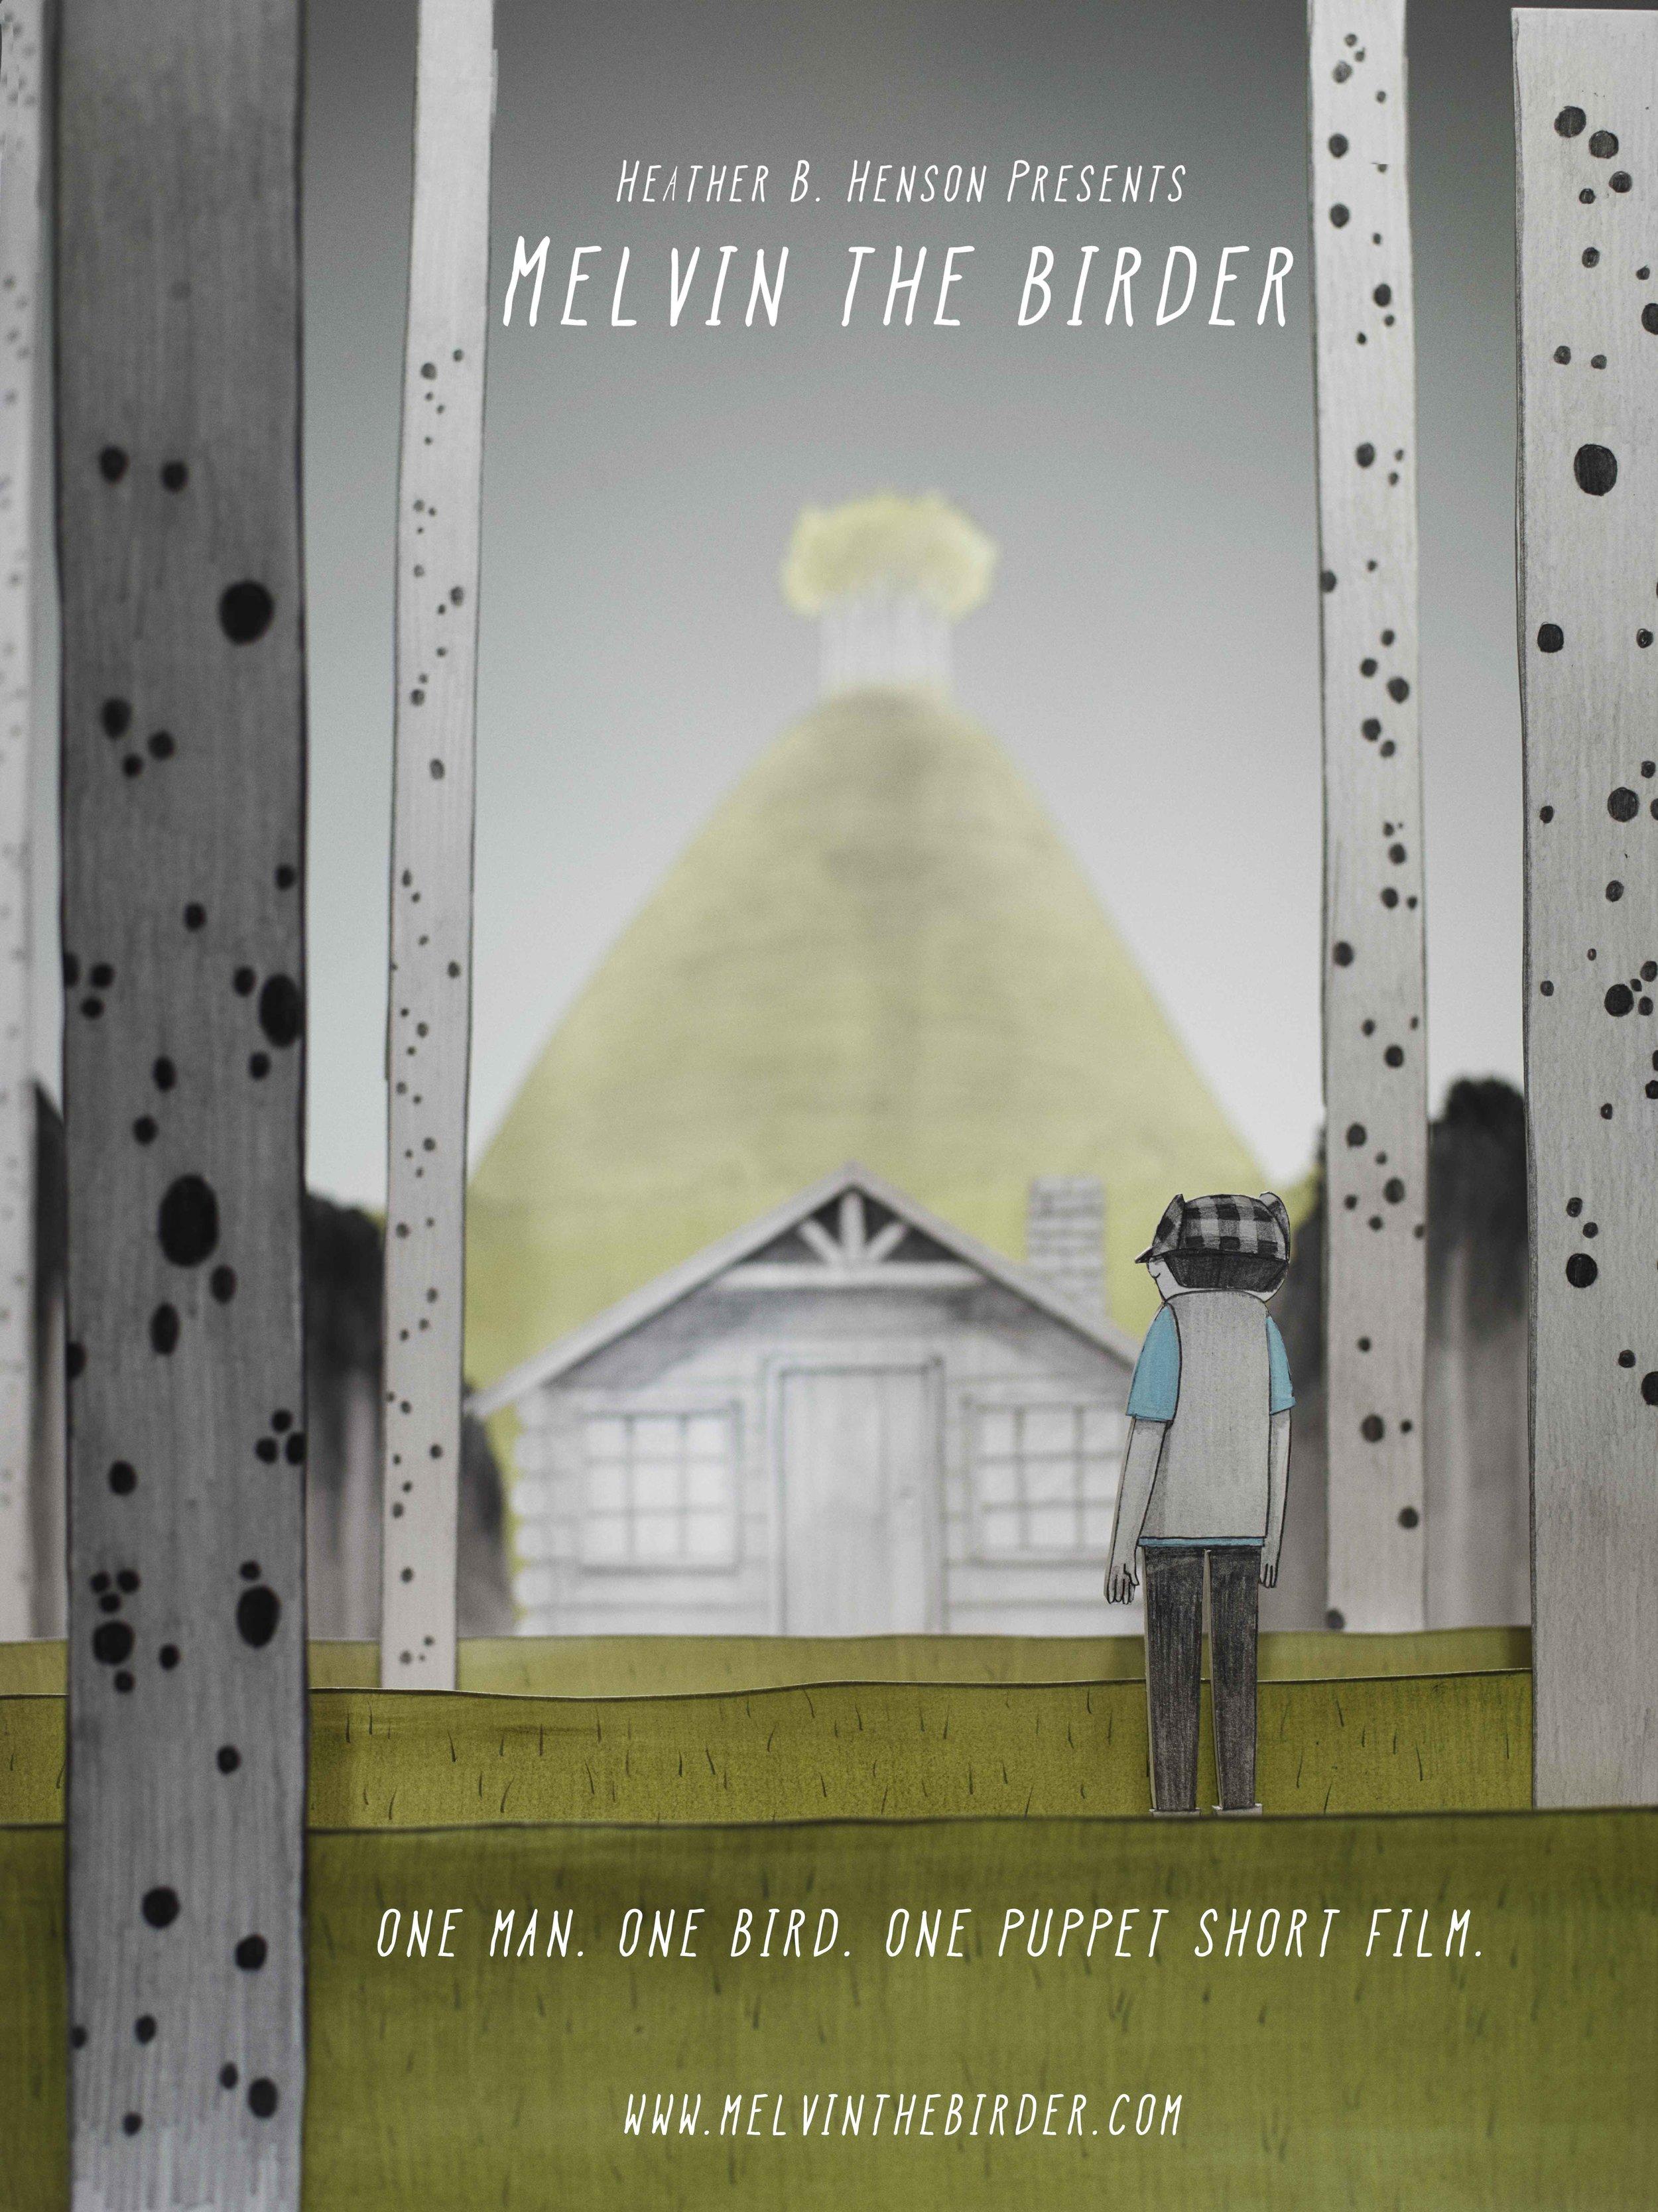 Melvin The Birder